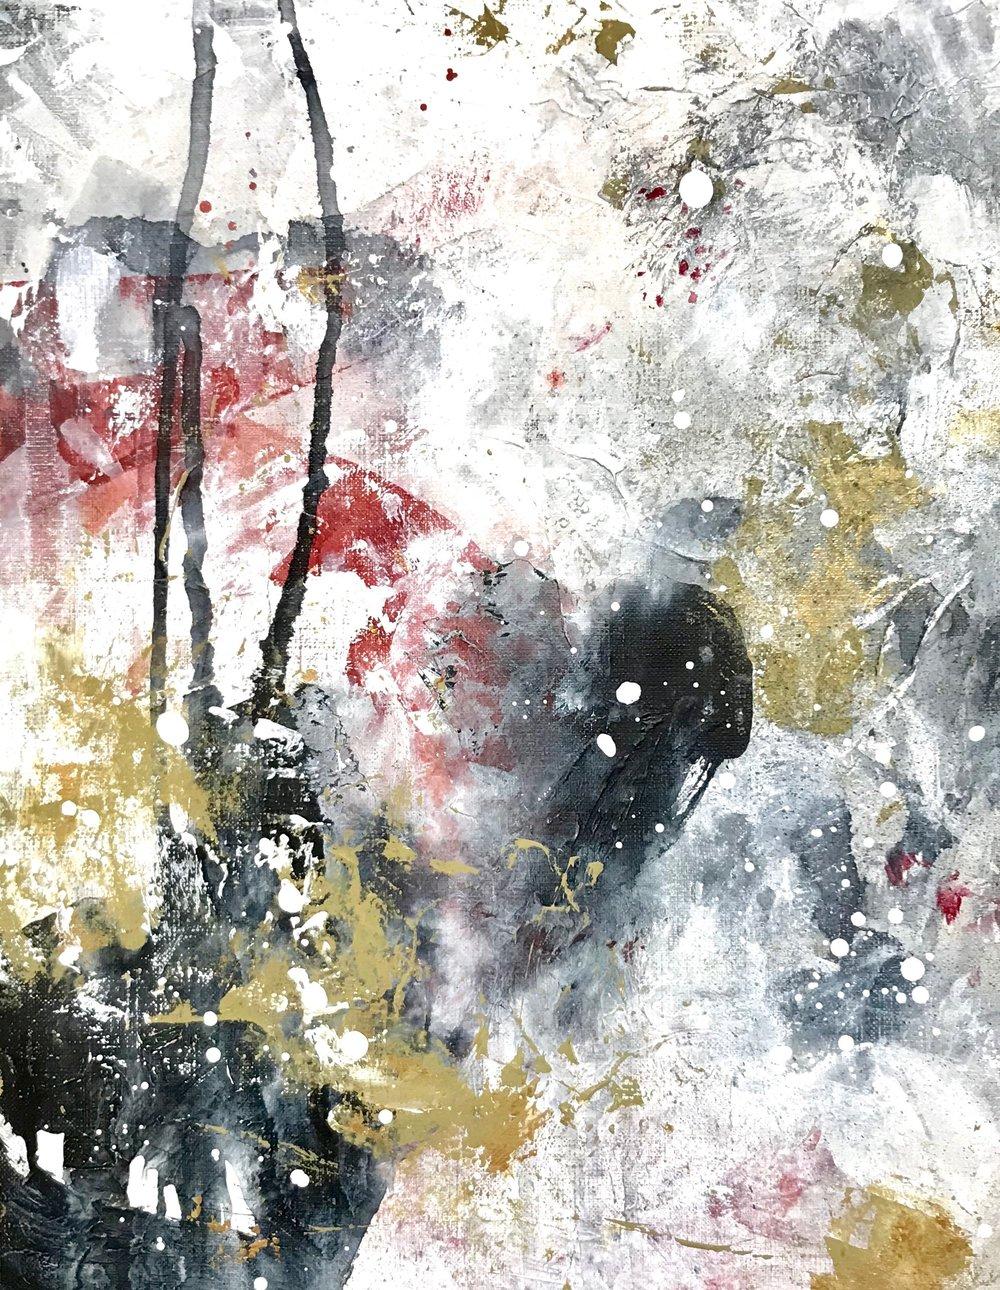 Untitled_nov11171  Mixed media on canvas.  40.9×31.8cm